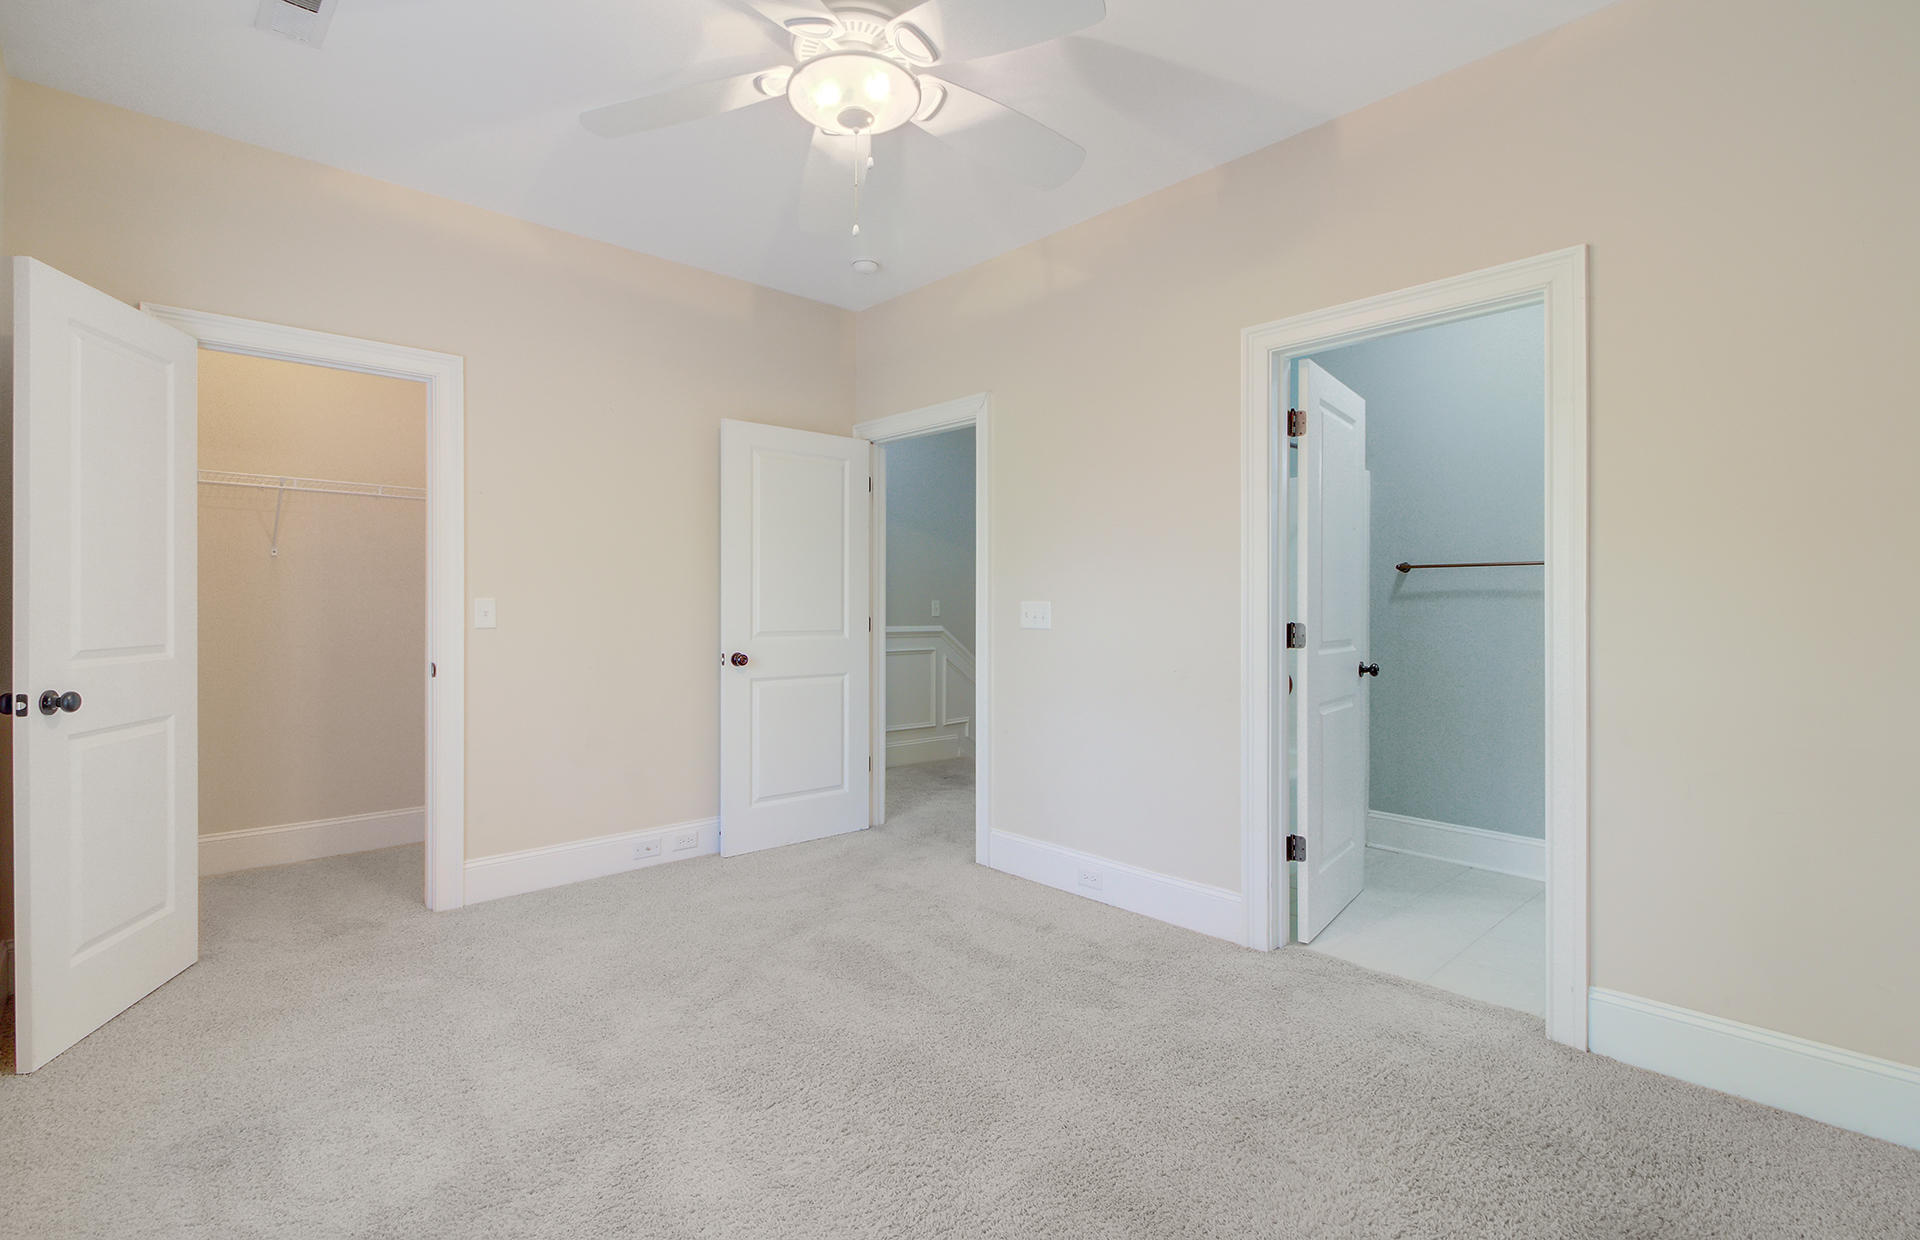 Carol Oaks Town Homes Homes For Sale - 2960 Emma, Mount Pleasant, SC - 14